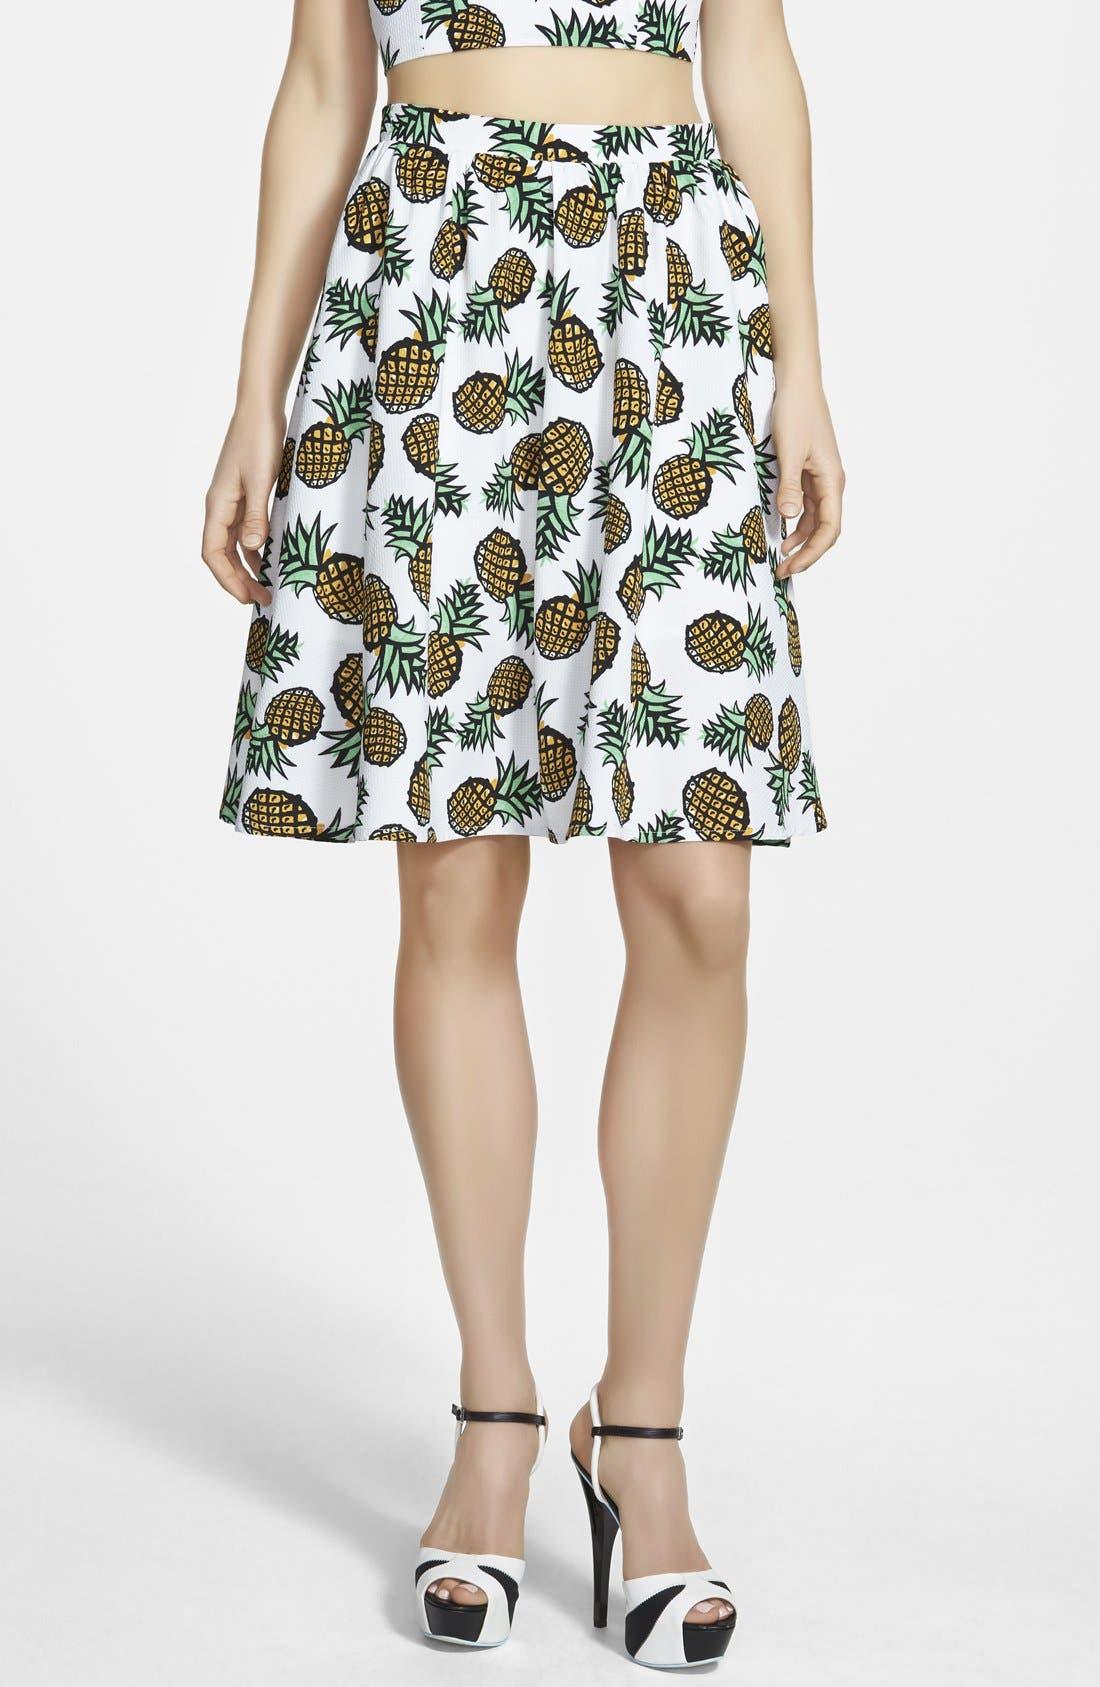 Alternate Image 1 Selected - Piece Goods Pineapple Skirt